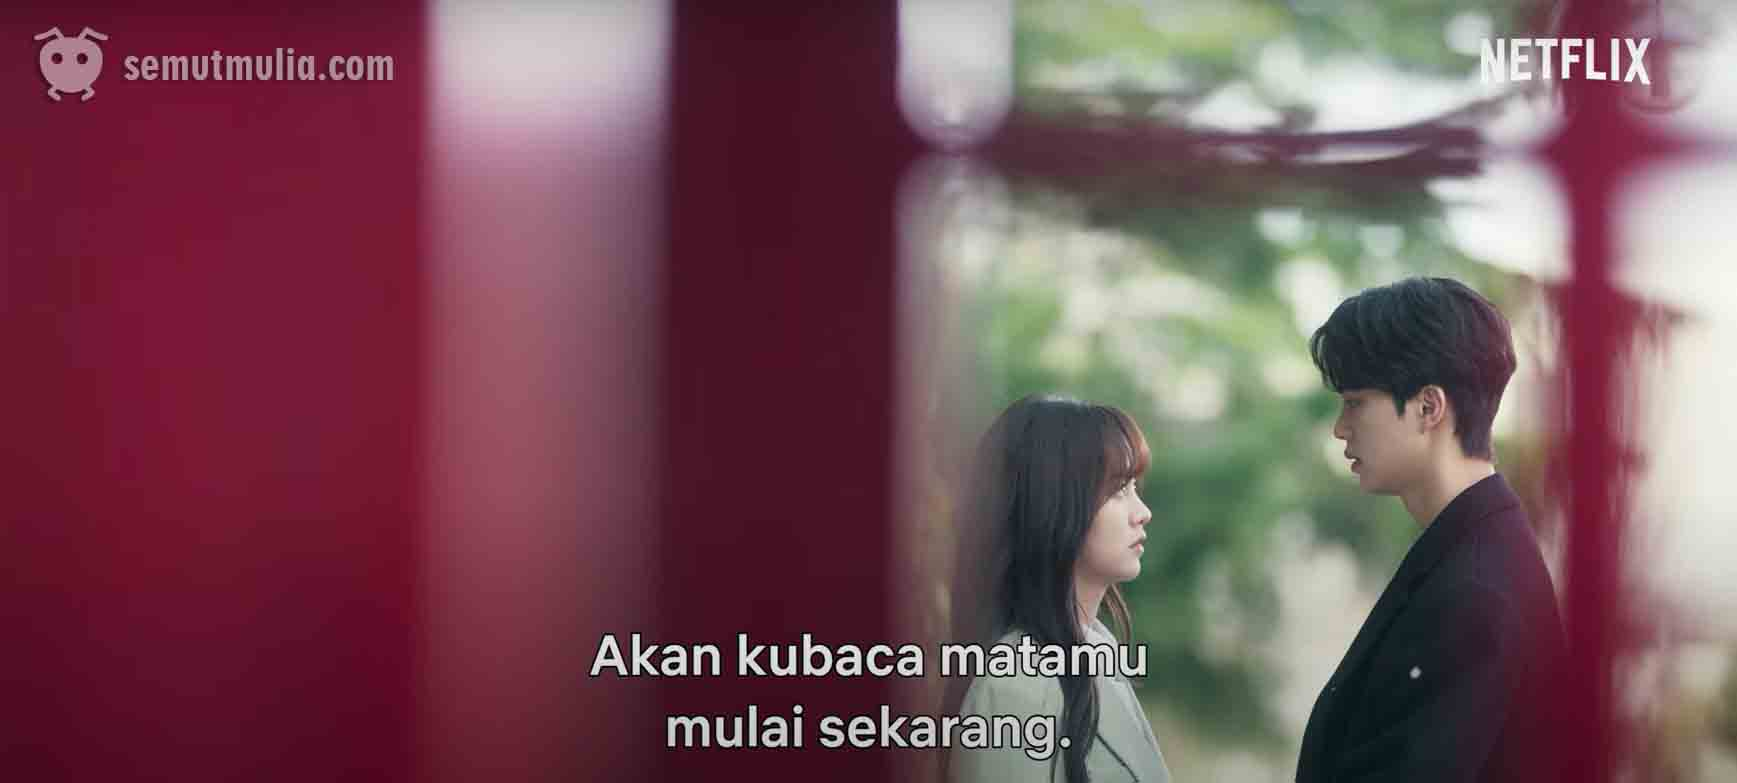 Sinopsis Love Alarm (Youtube : Netflix Indonesia) 2